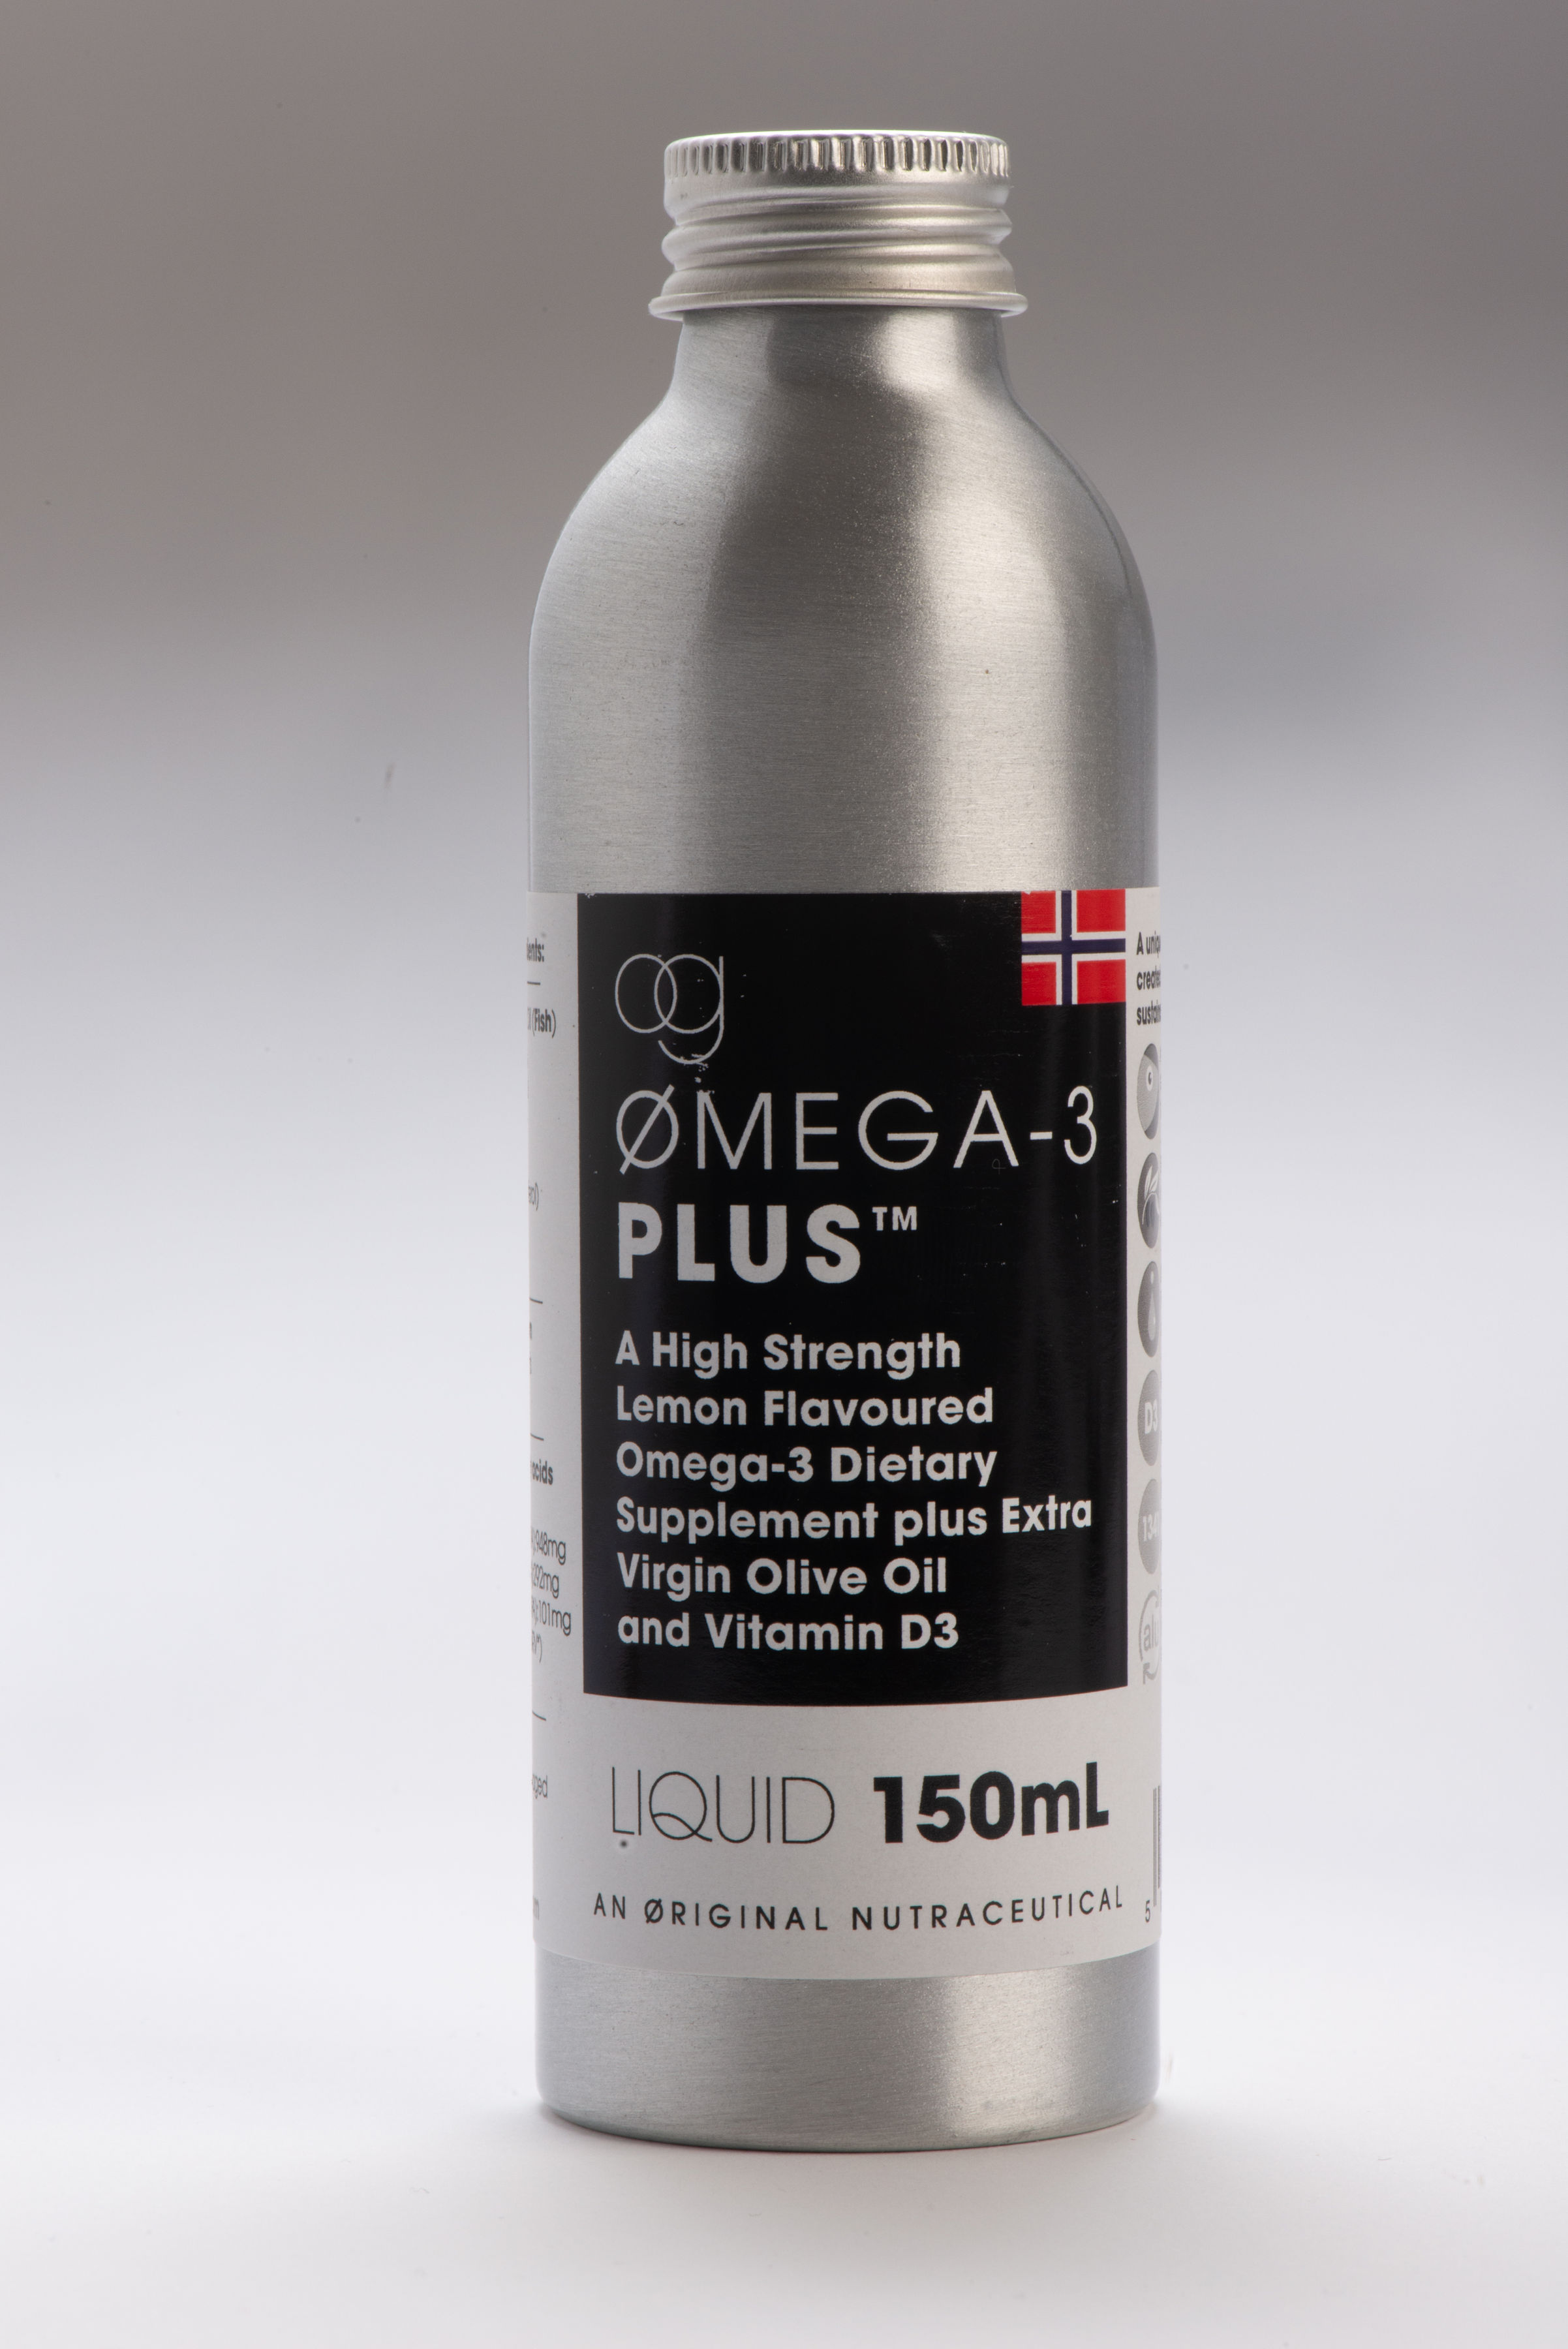 OG Omega-3 PLUS Liquid 150ml